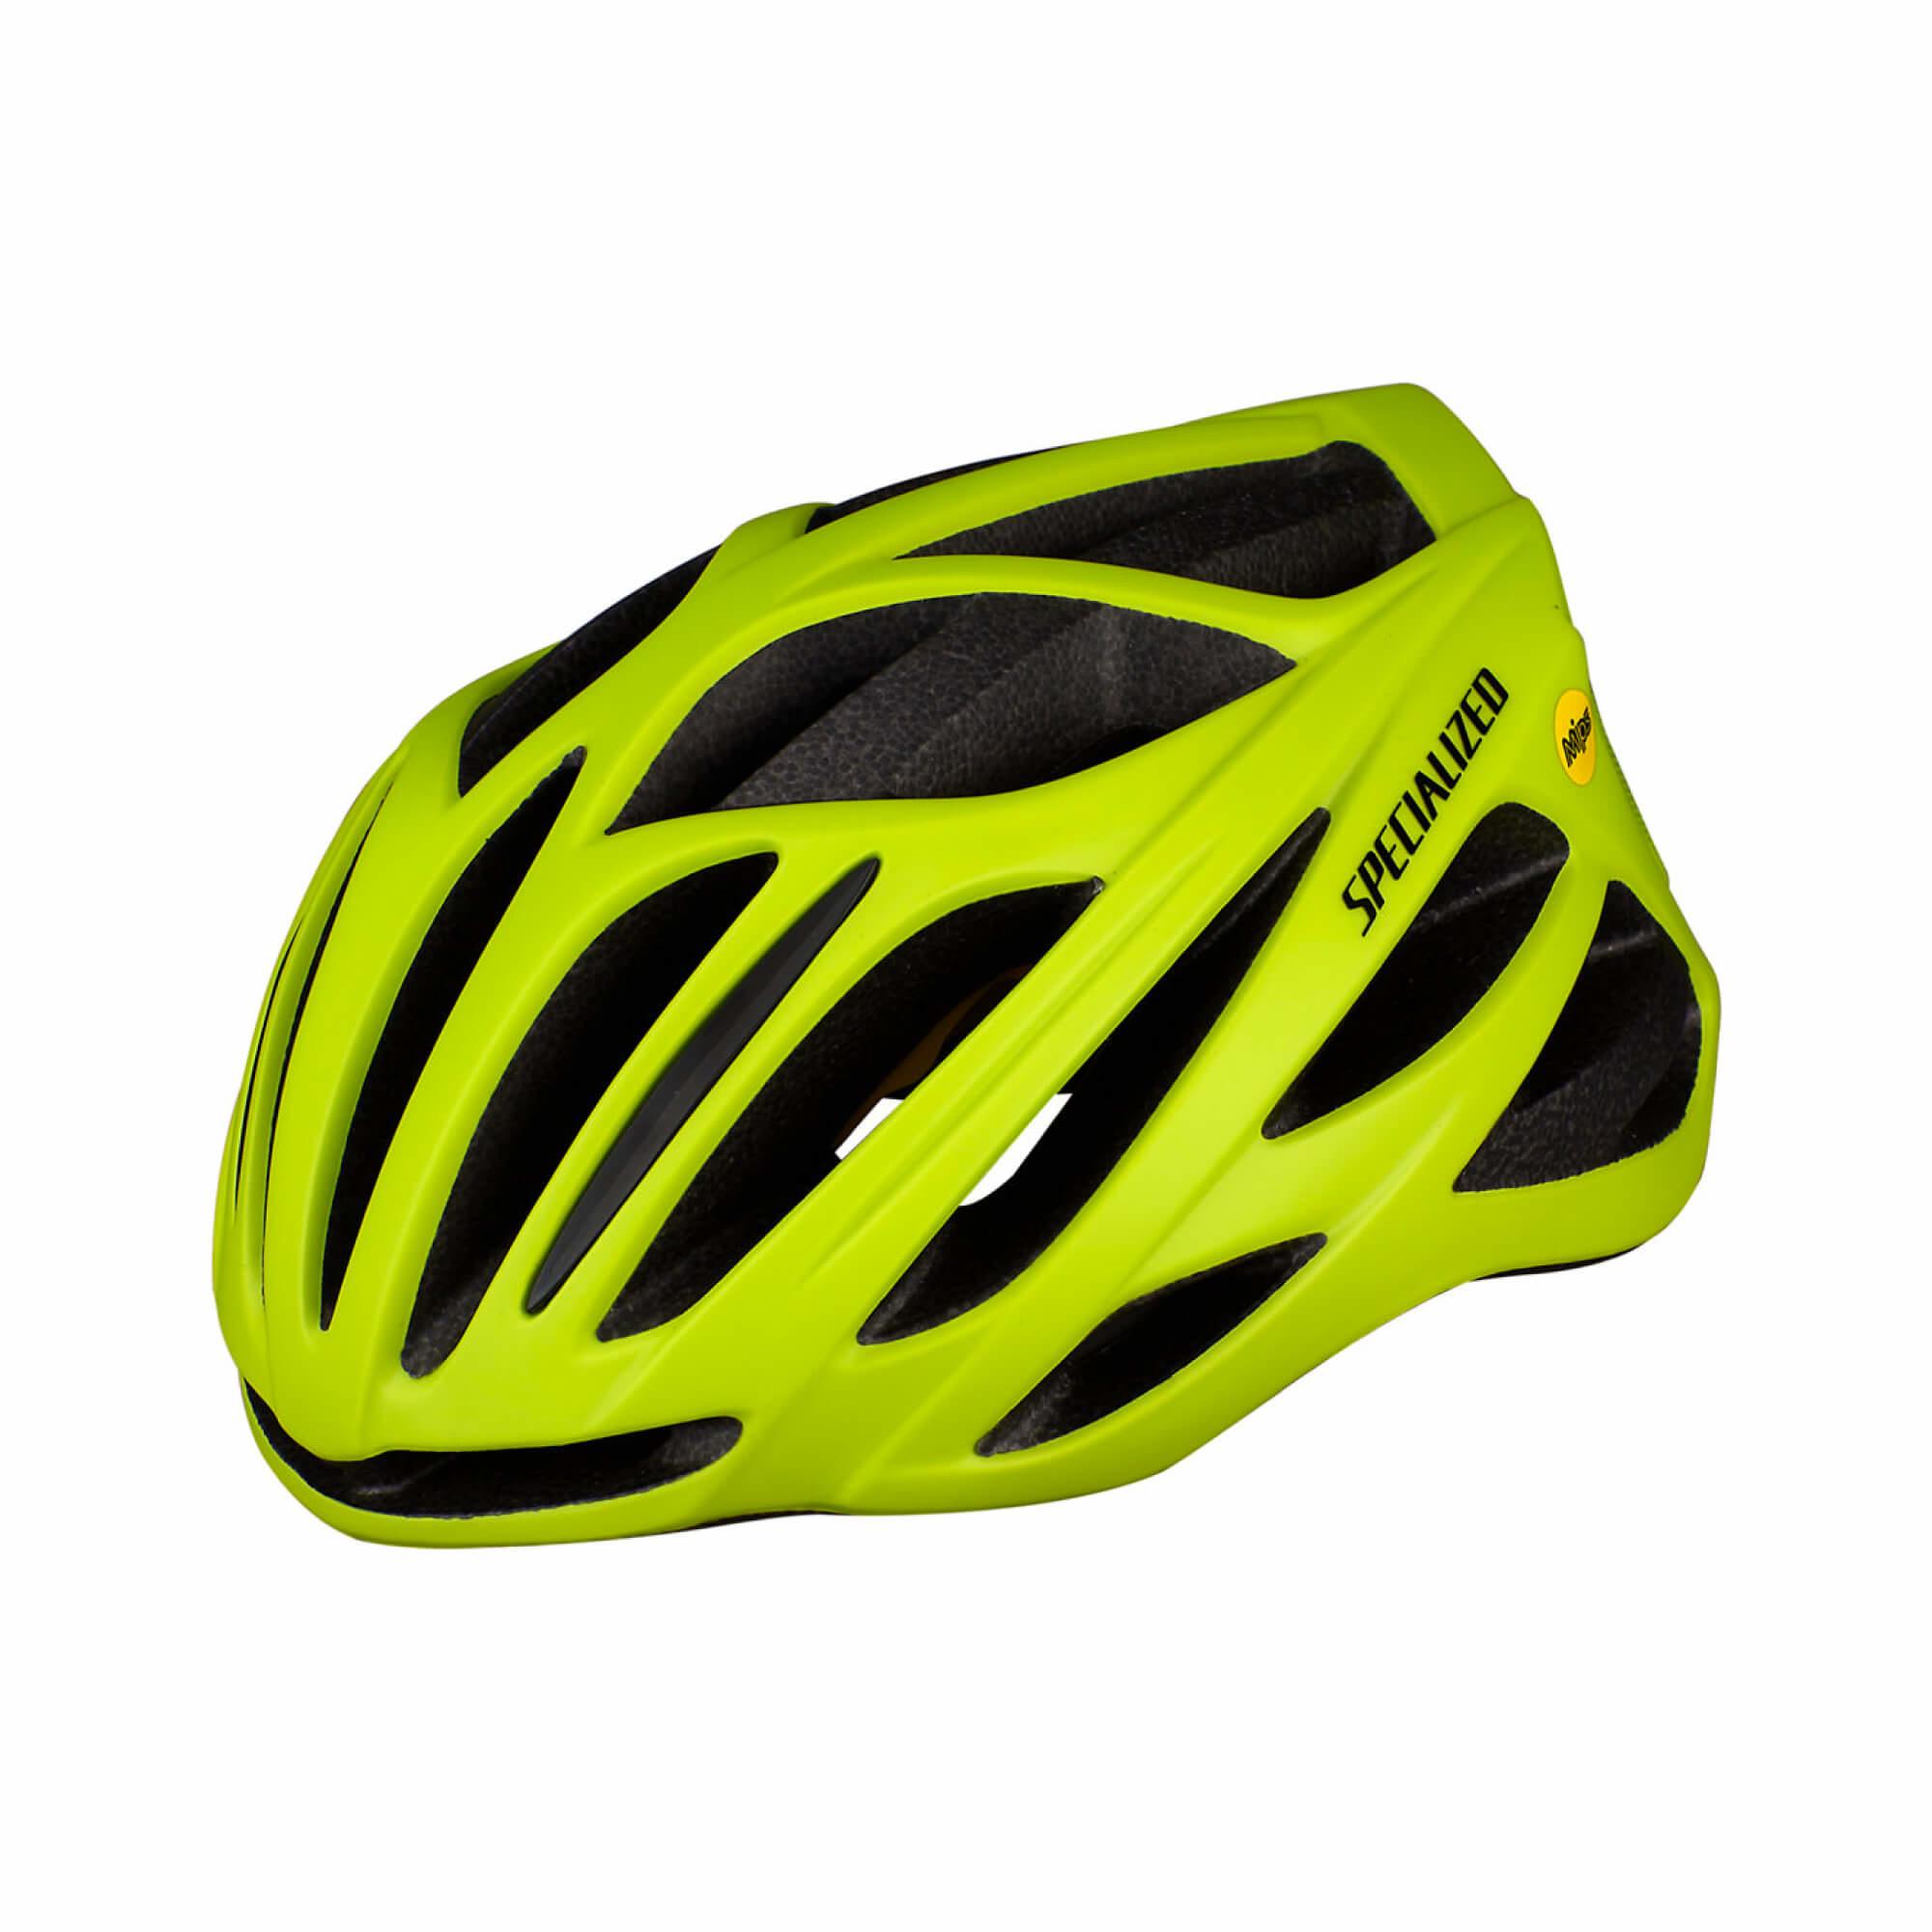 Echelon II Helmet Mips-5